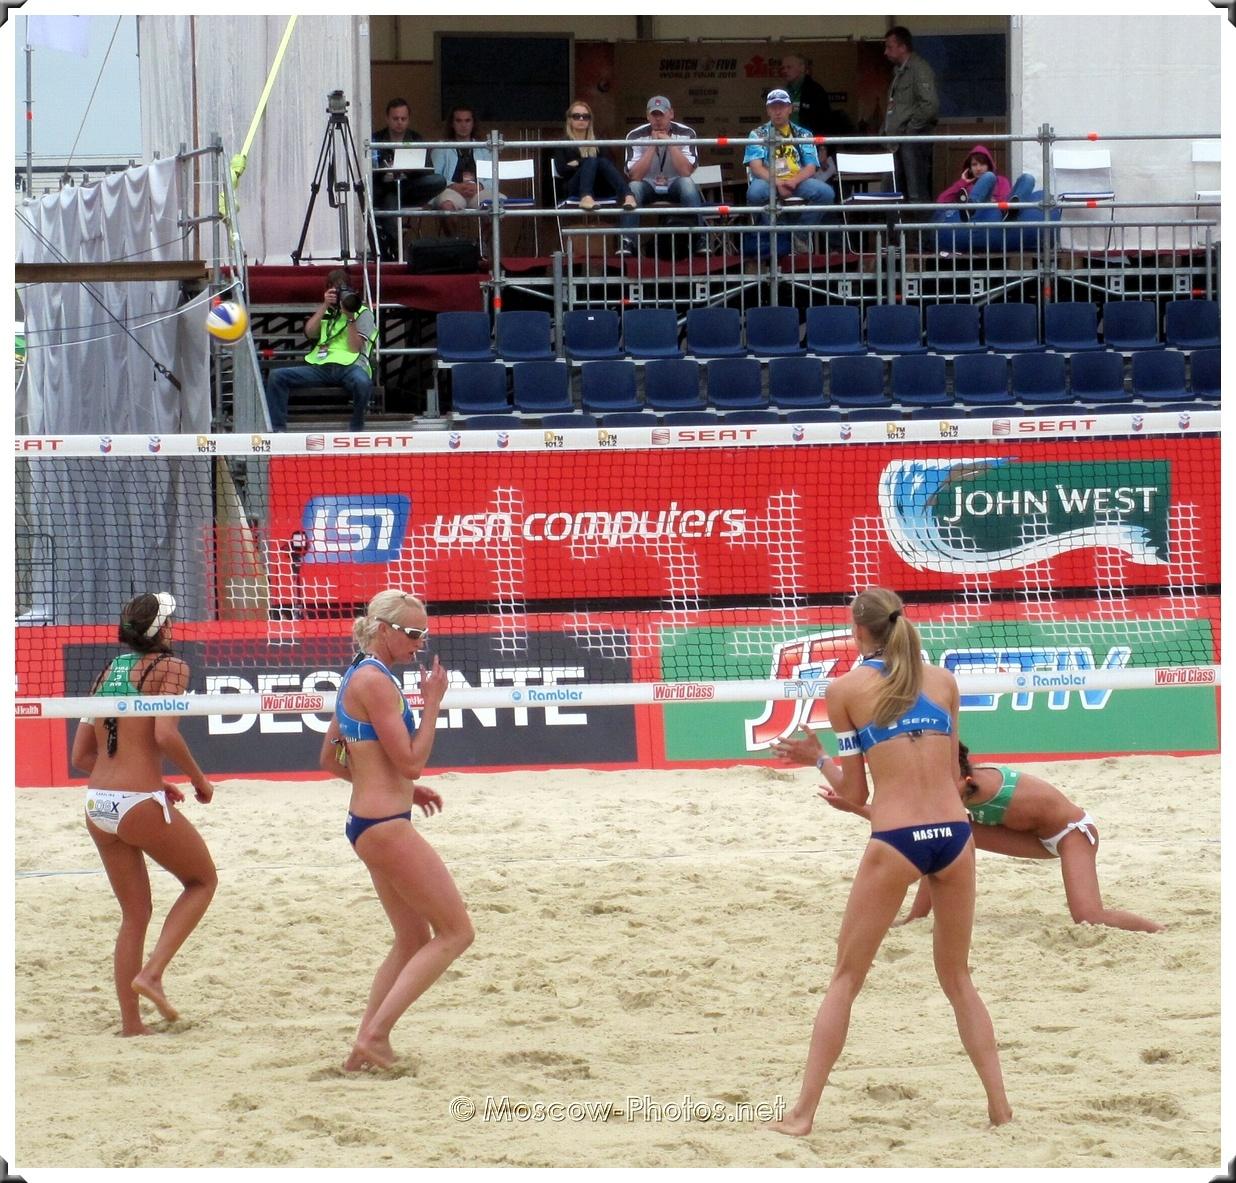 Moscow Grand Slam Beach Volleyball World Tour 2010